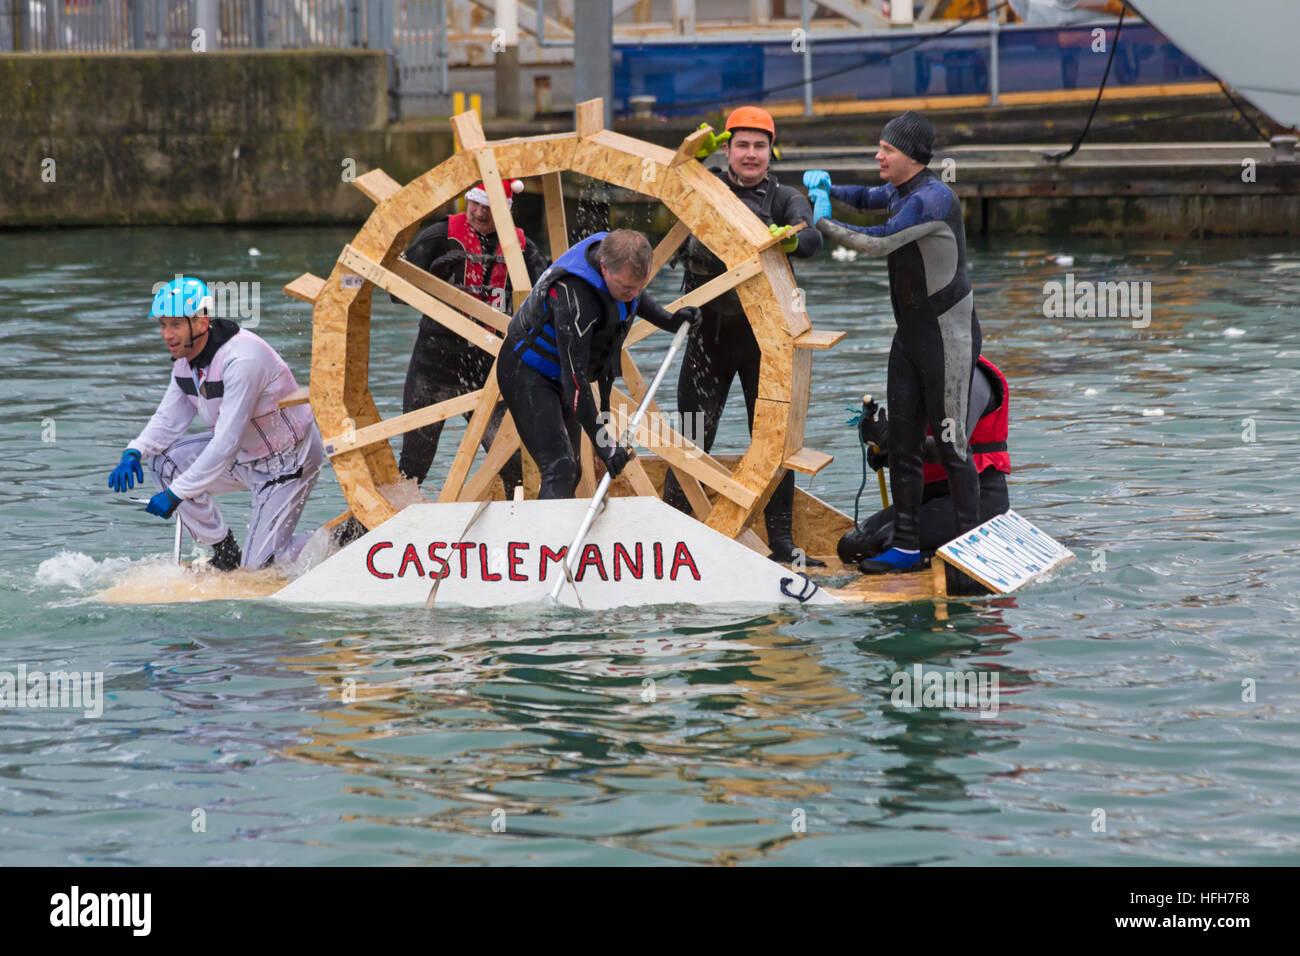 Castle Mania >> Castle Mania Stock Photos Castle Mania Stock Images Alamy